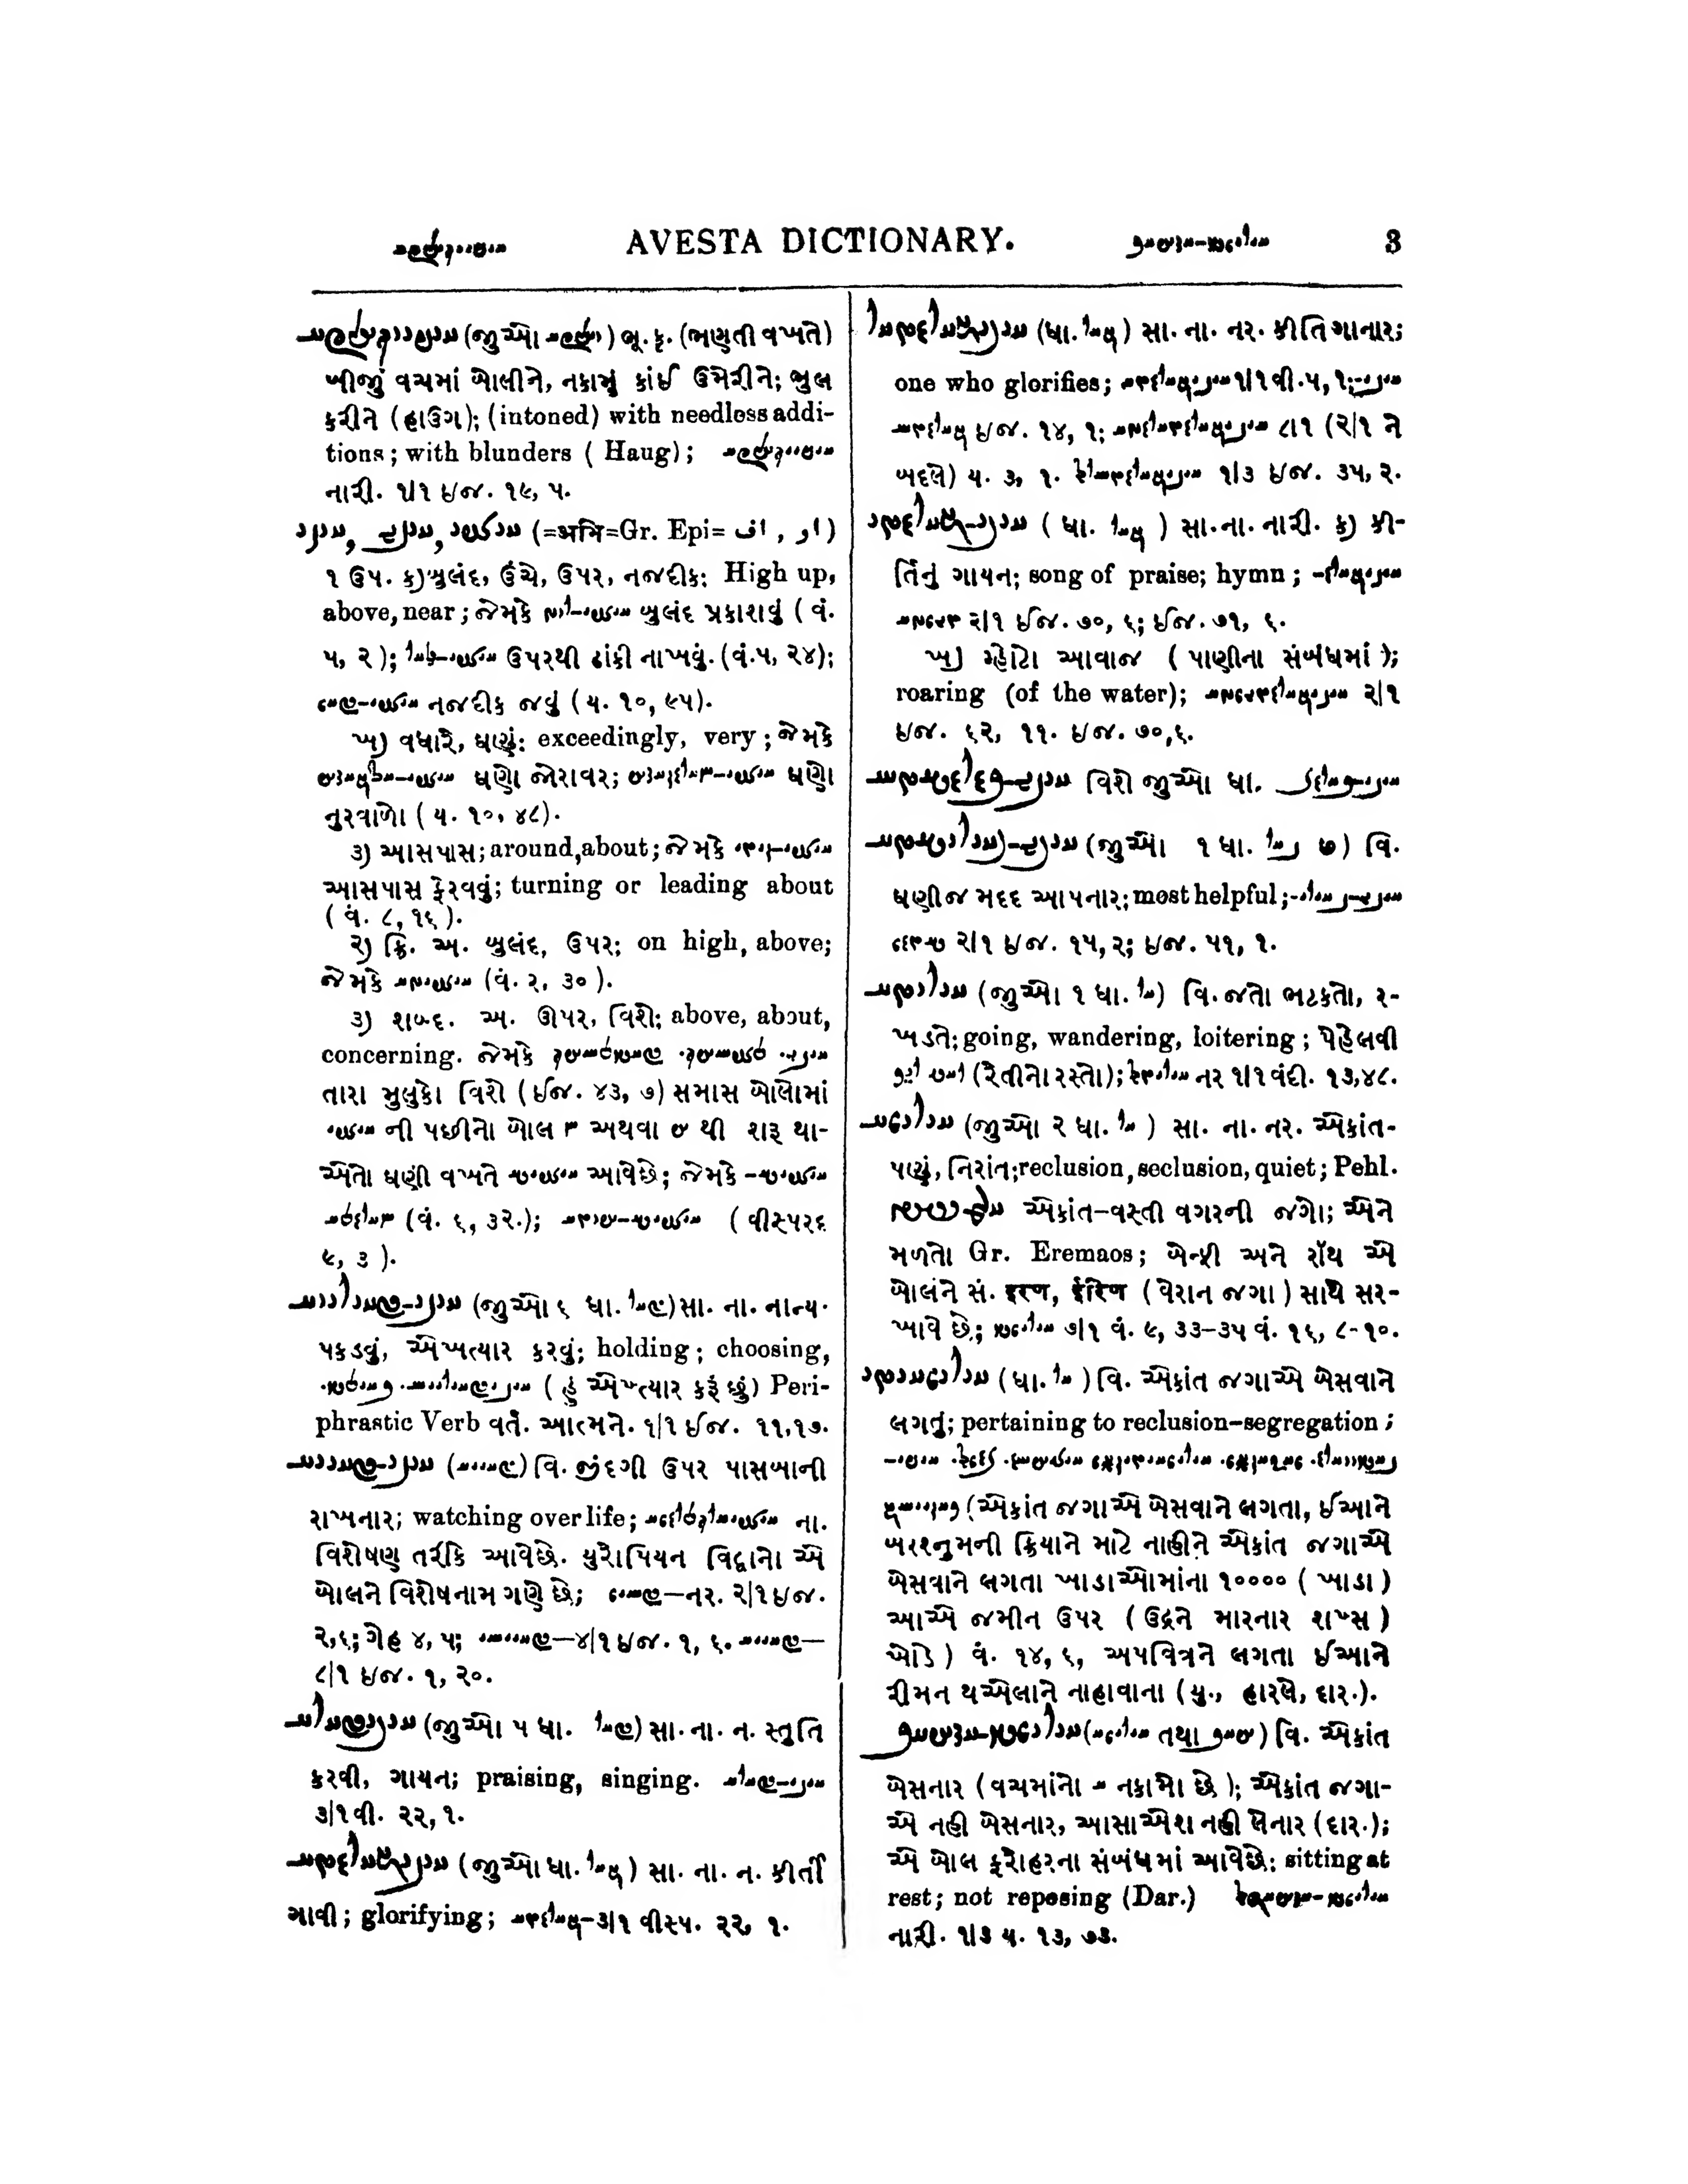 K  E  Kanga: Avesta Dictionary